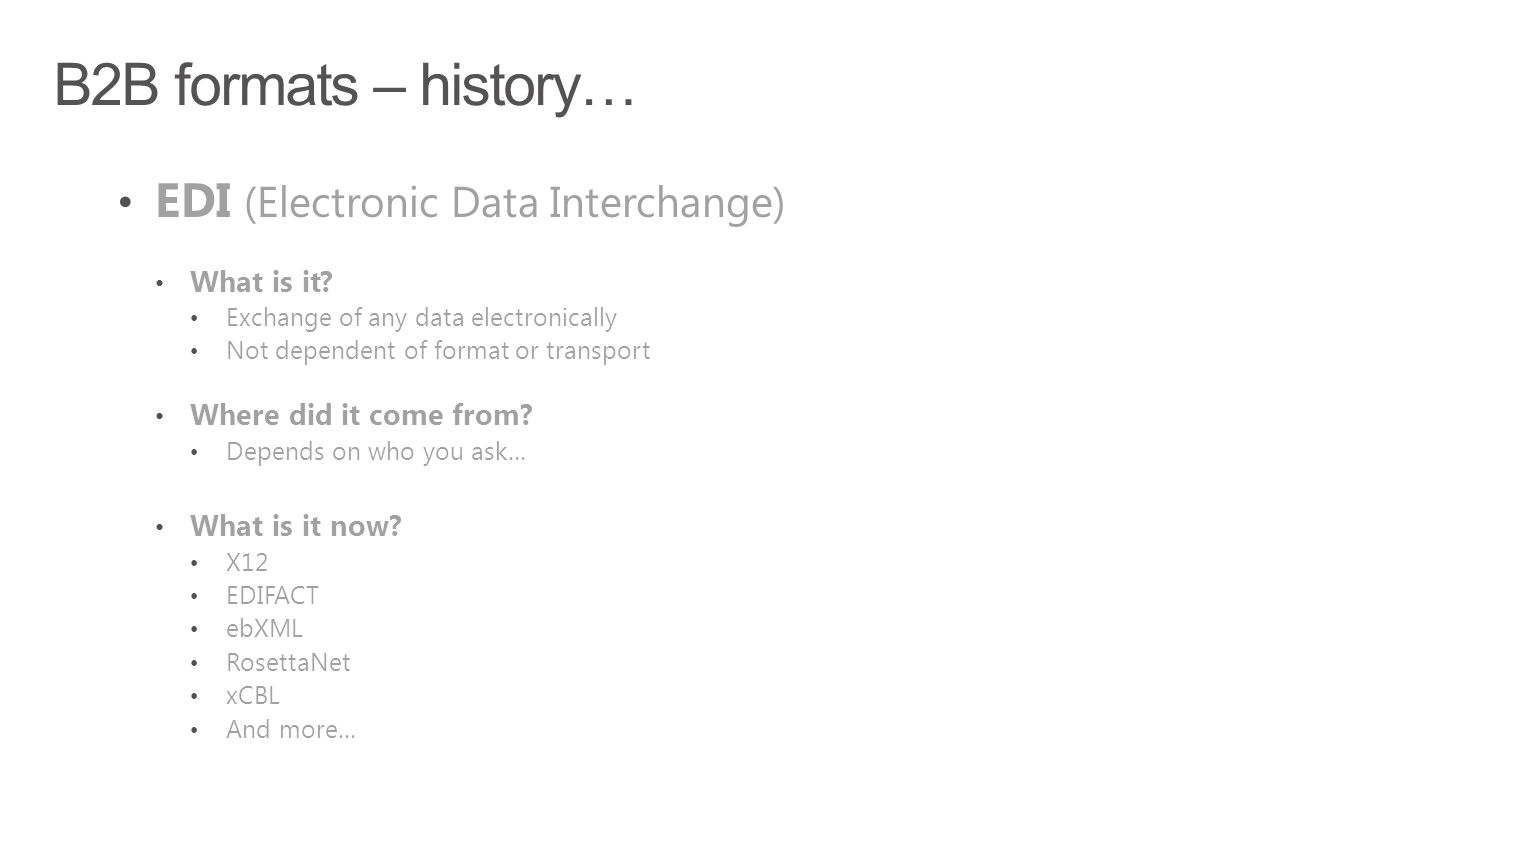 B2B formats – history… EDI (Electronic Data Interchange) What is it